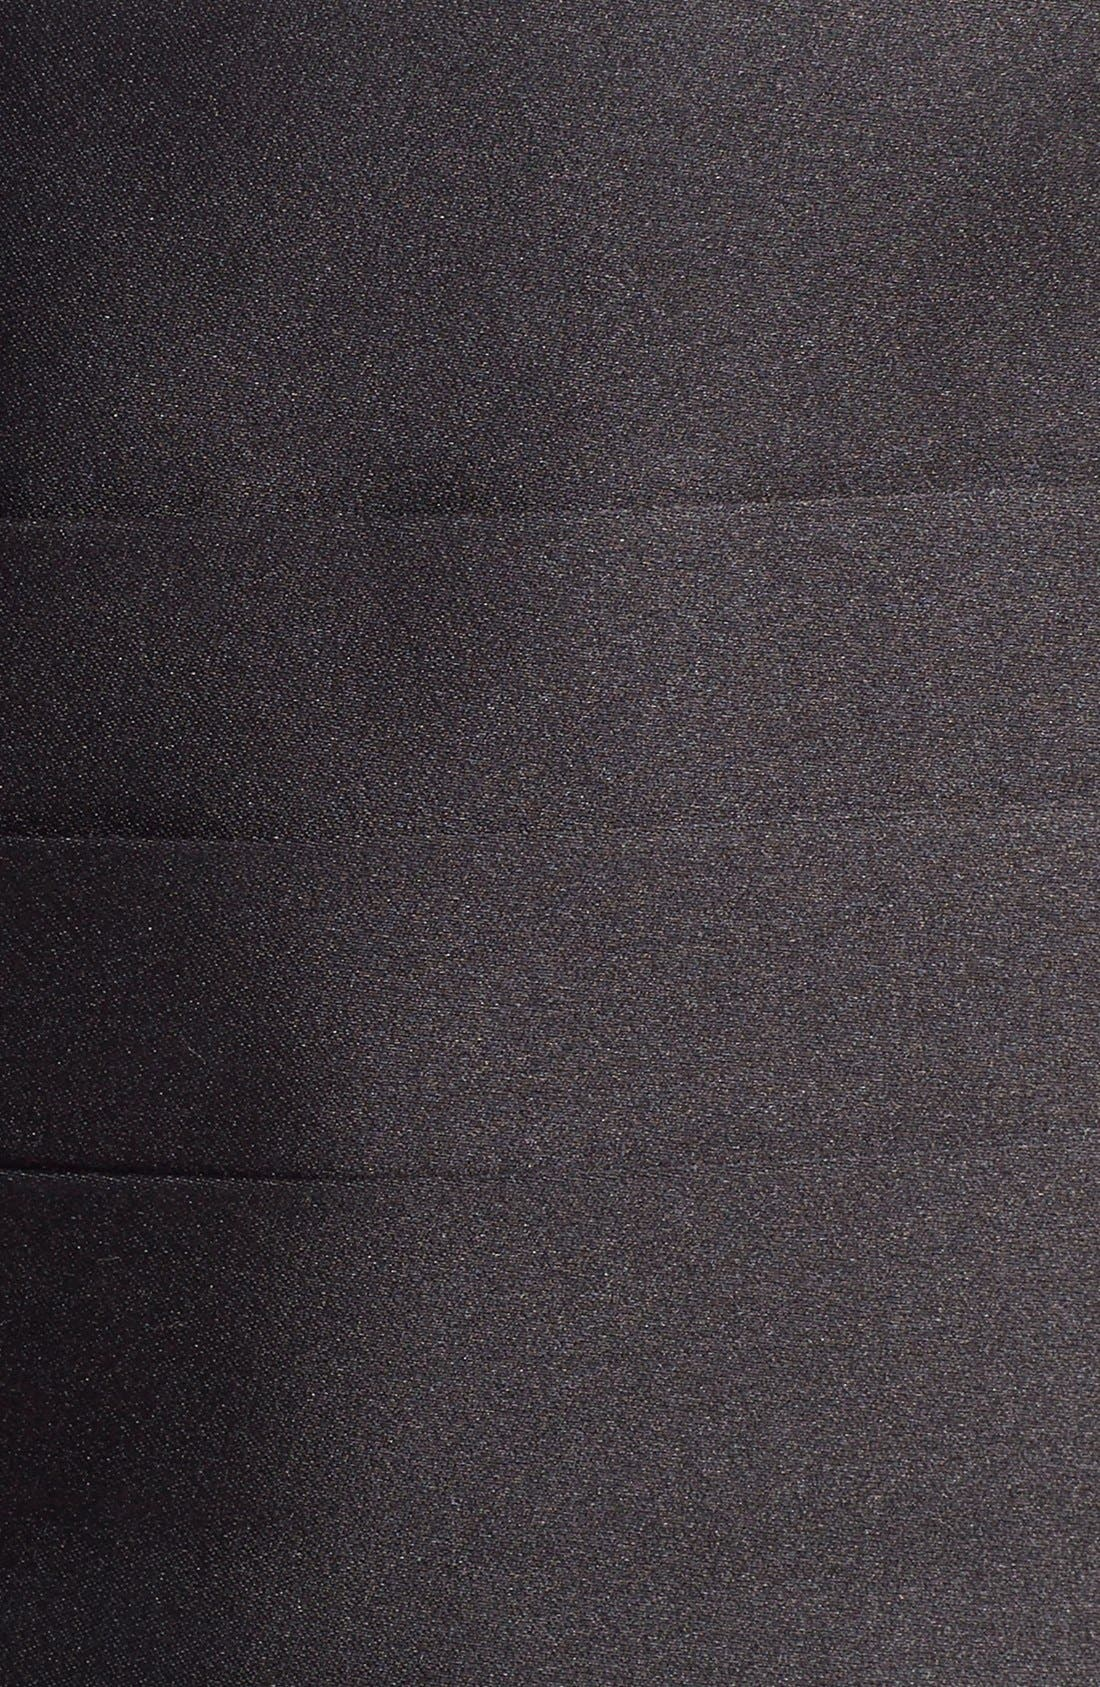 Alternate Image 2  - David Donahue Cummerbund & Self-Tied Bow Tie Set